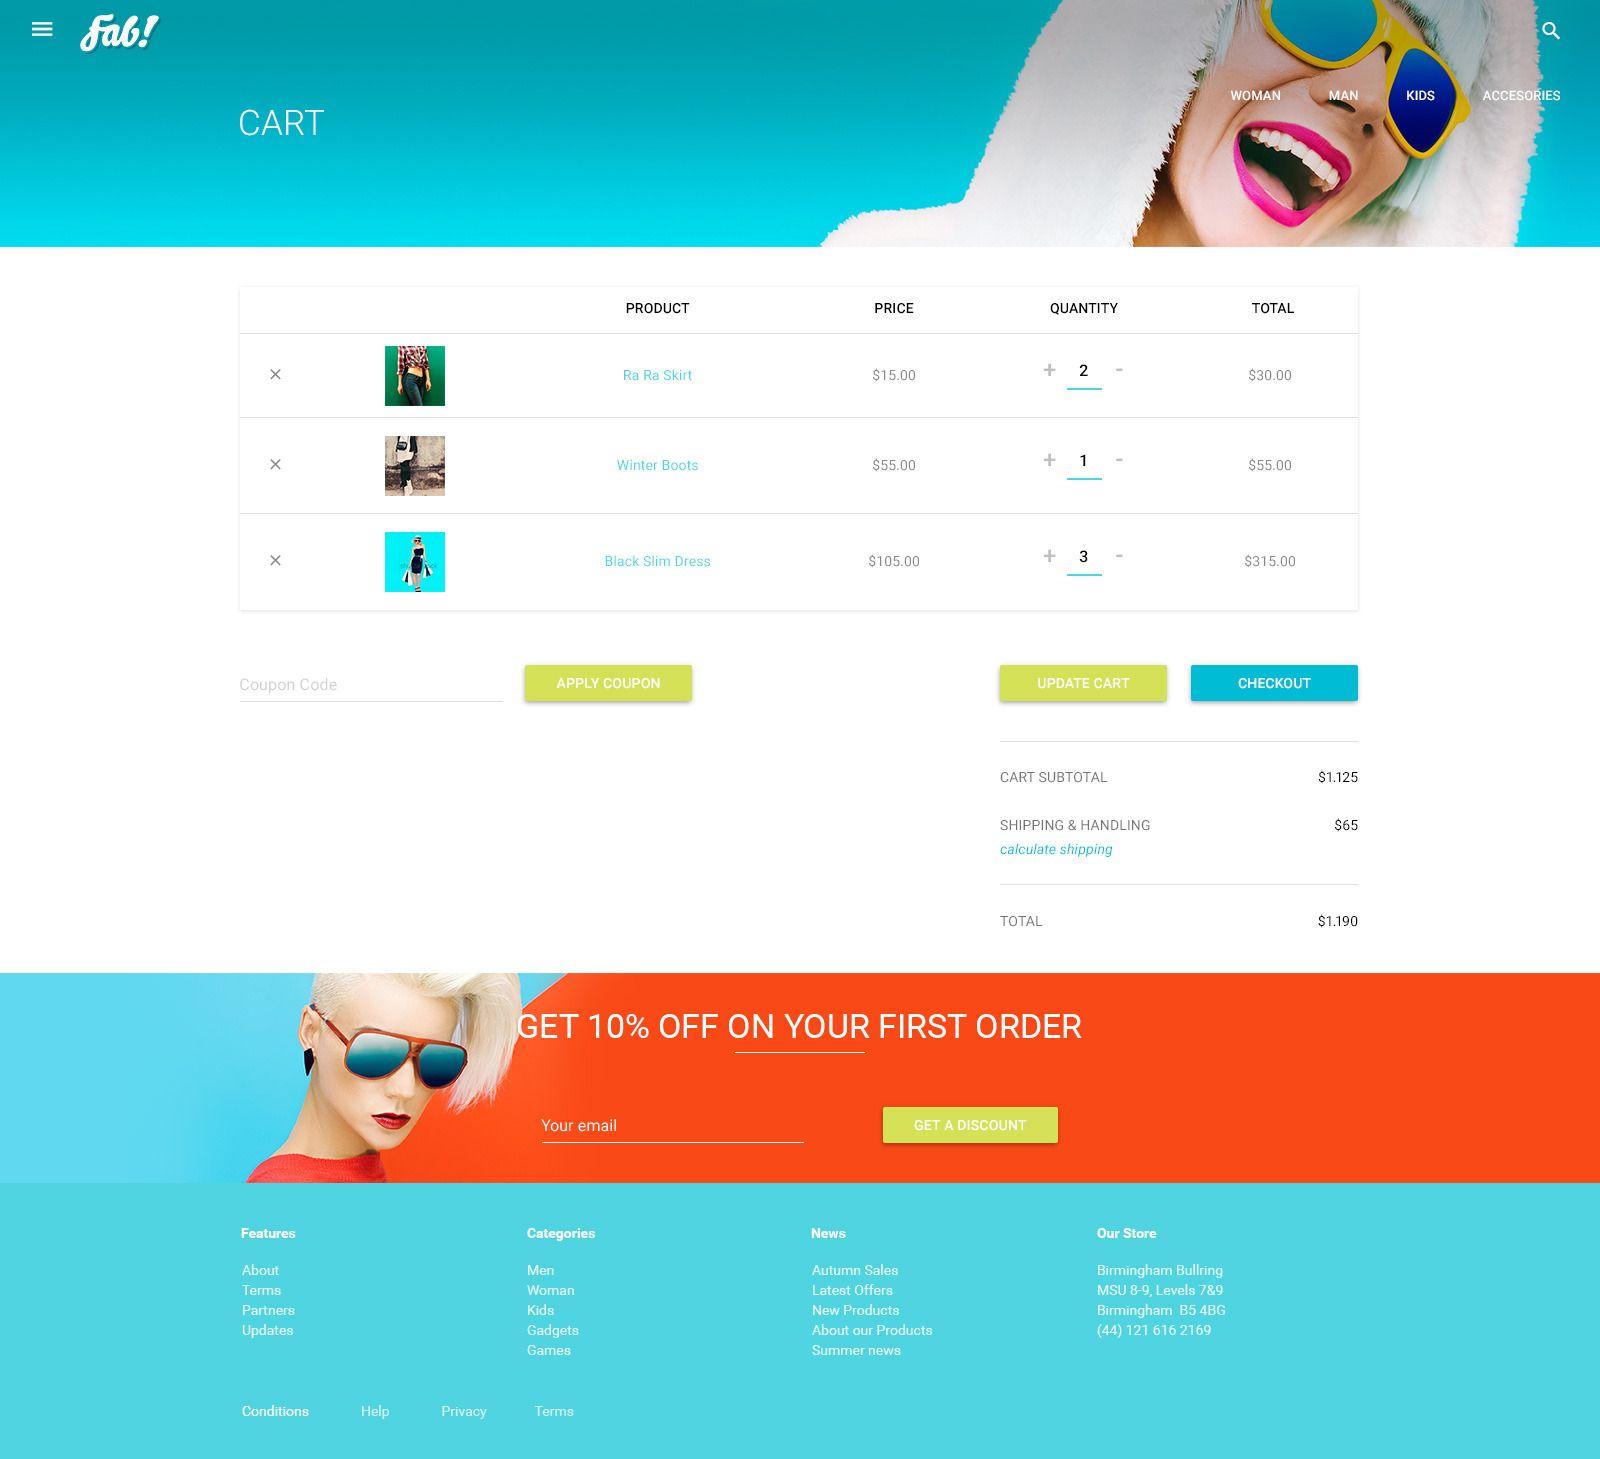 Fab Template: FAB! - Material Design Retail Shop PSD